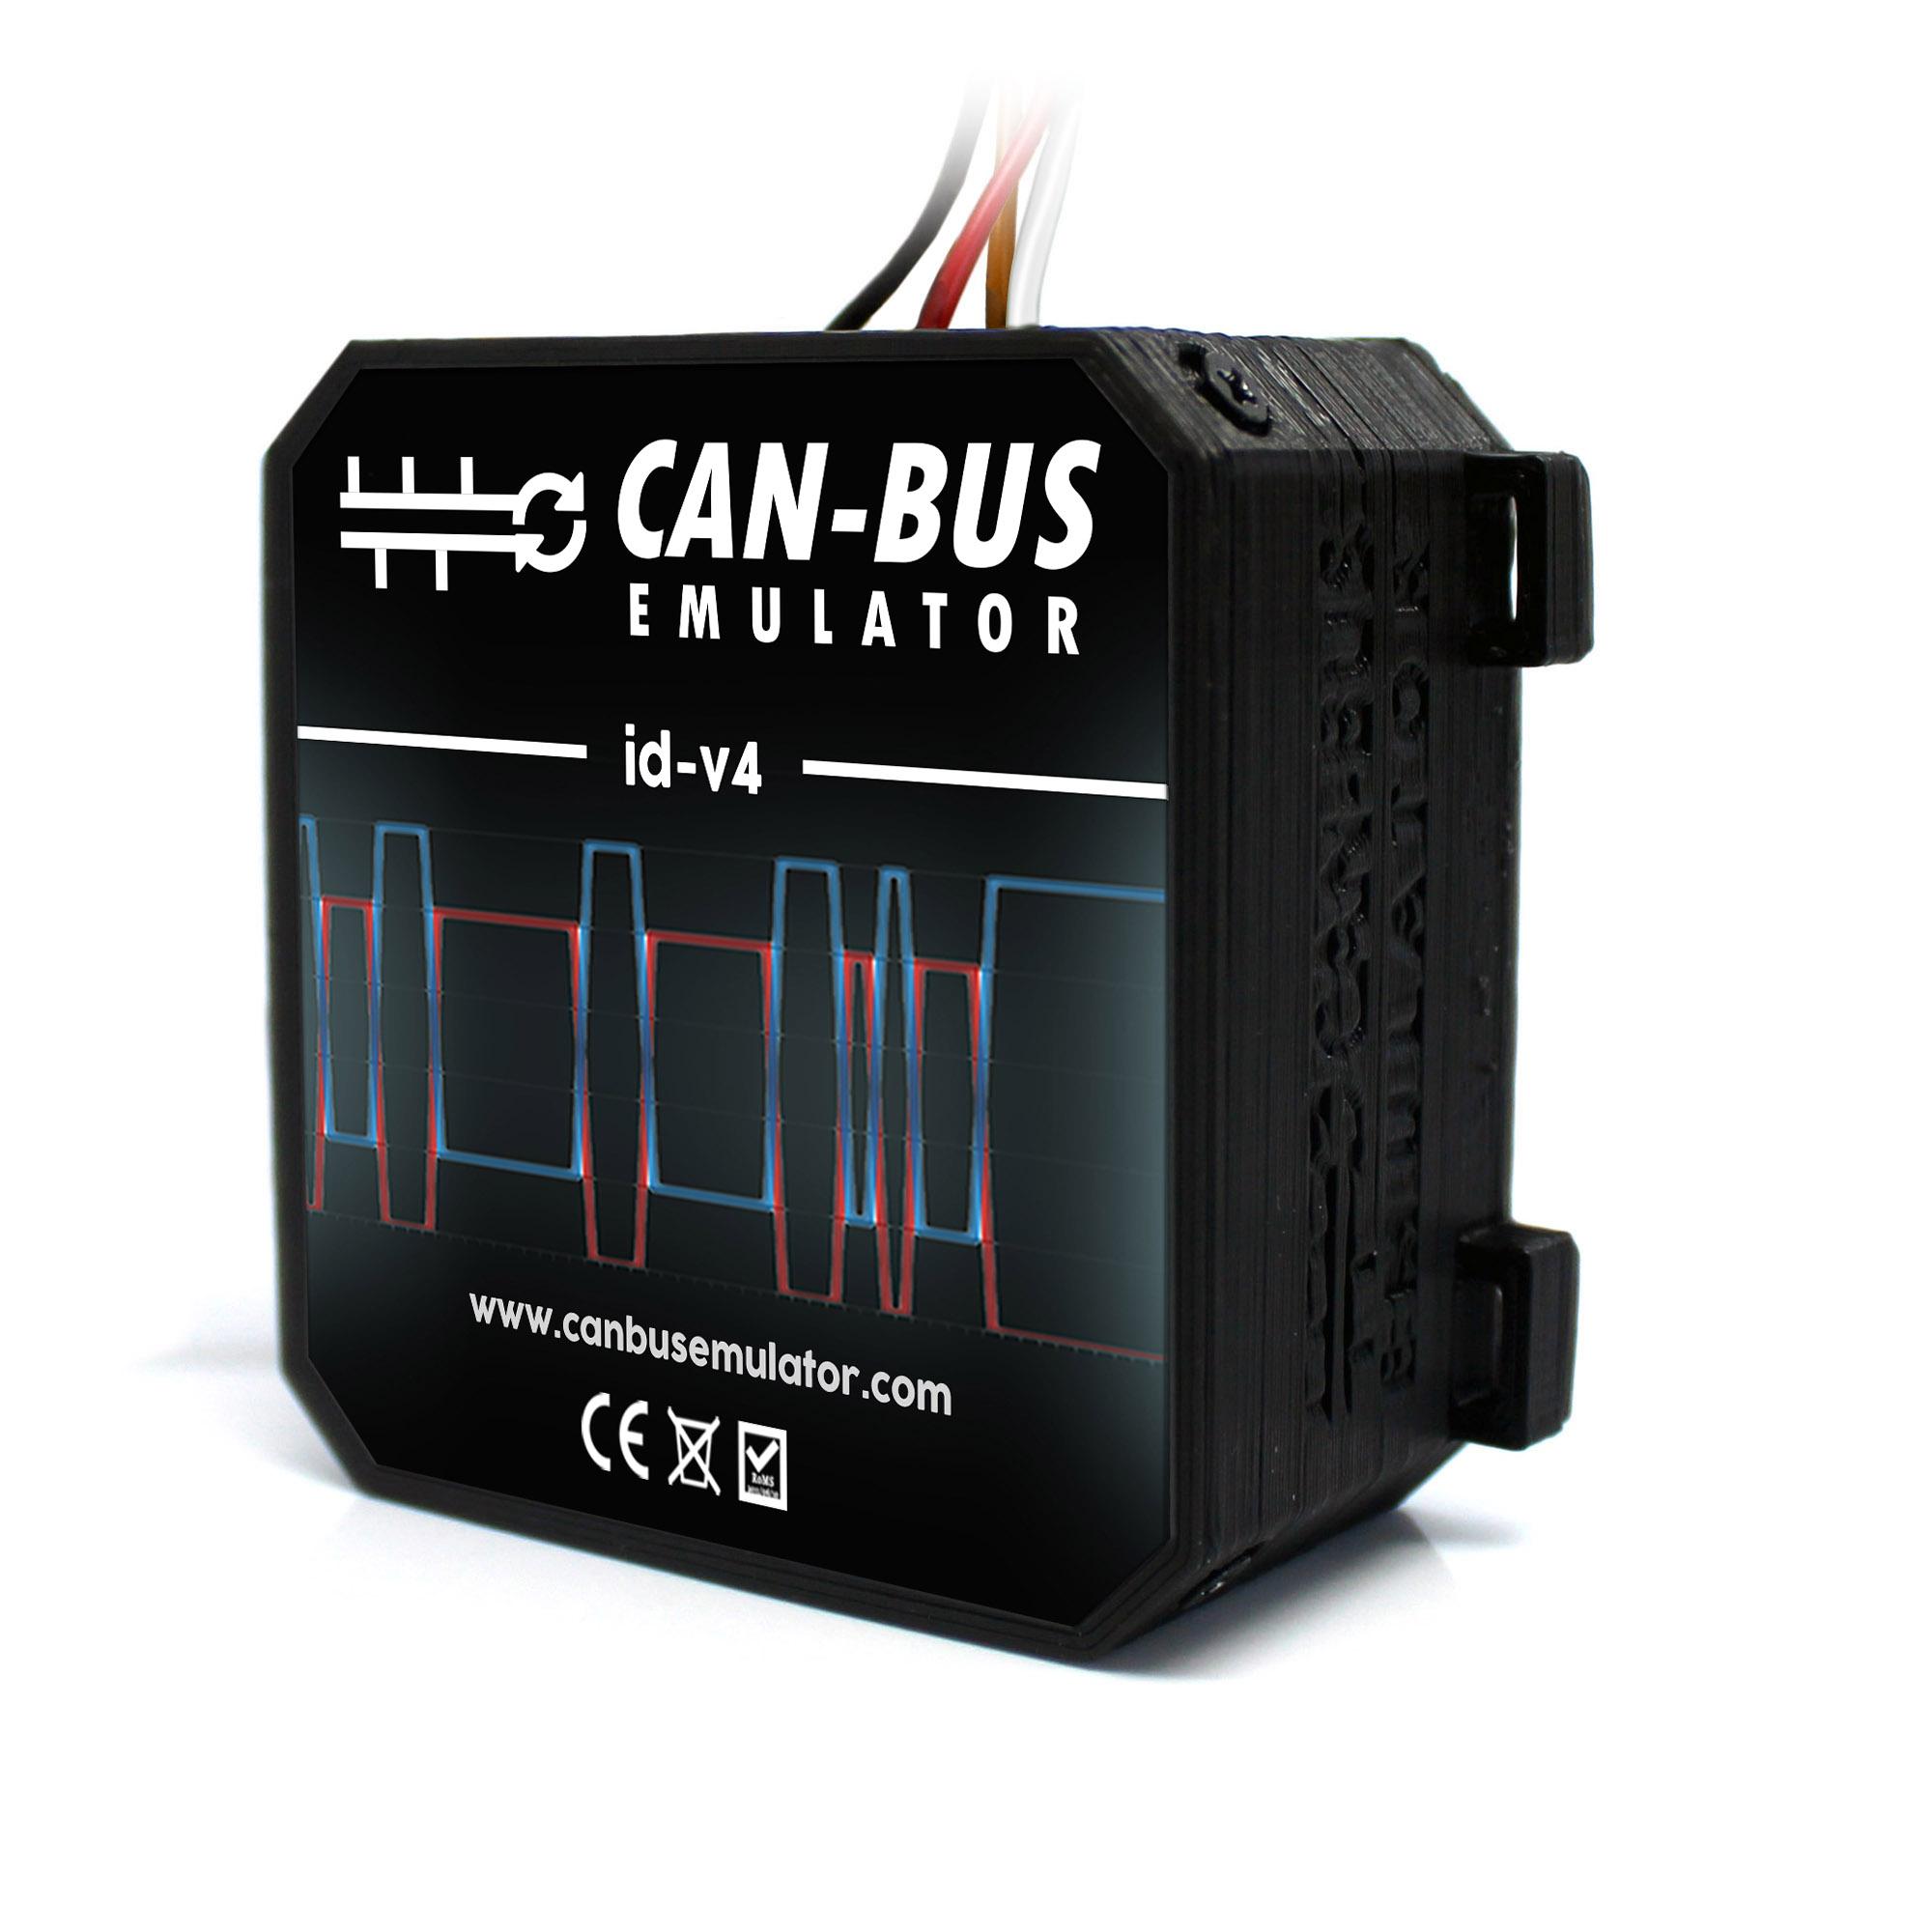 CASE Euro 4 Adblue Removal Emulator